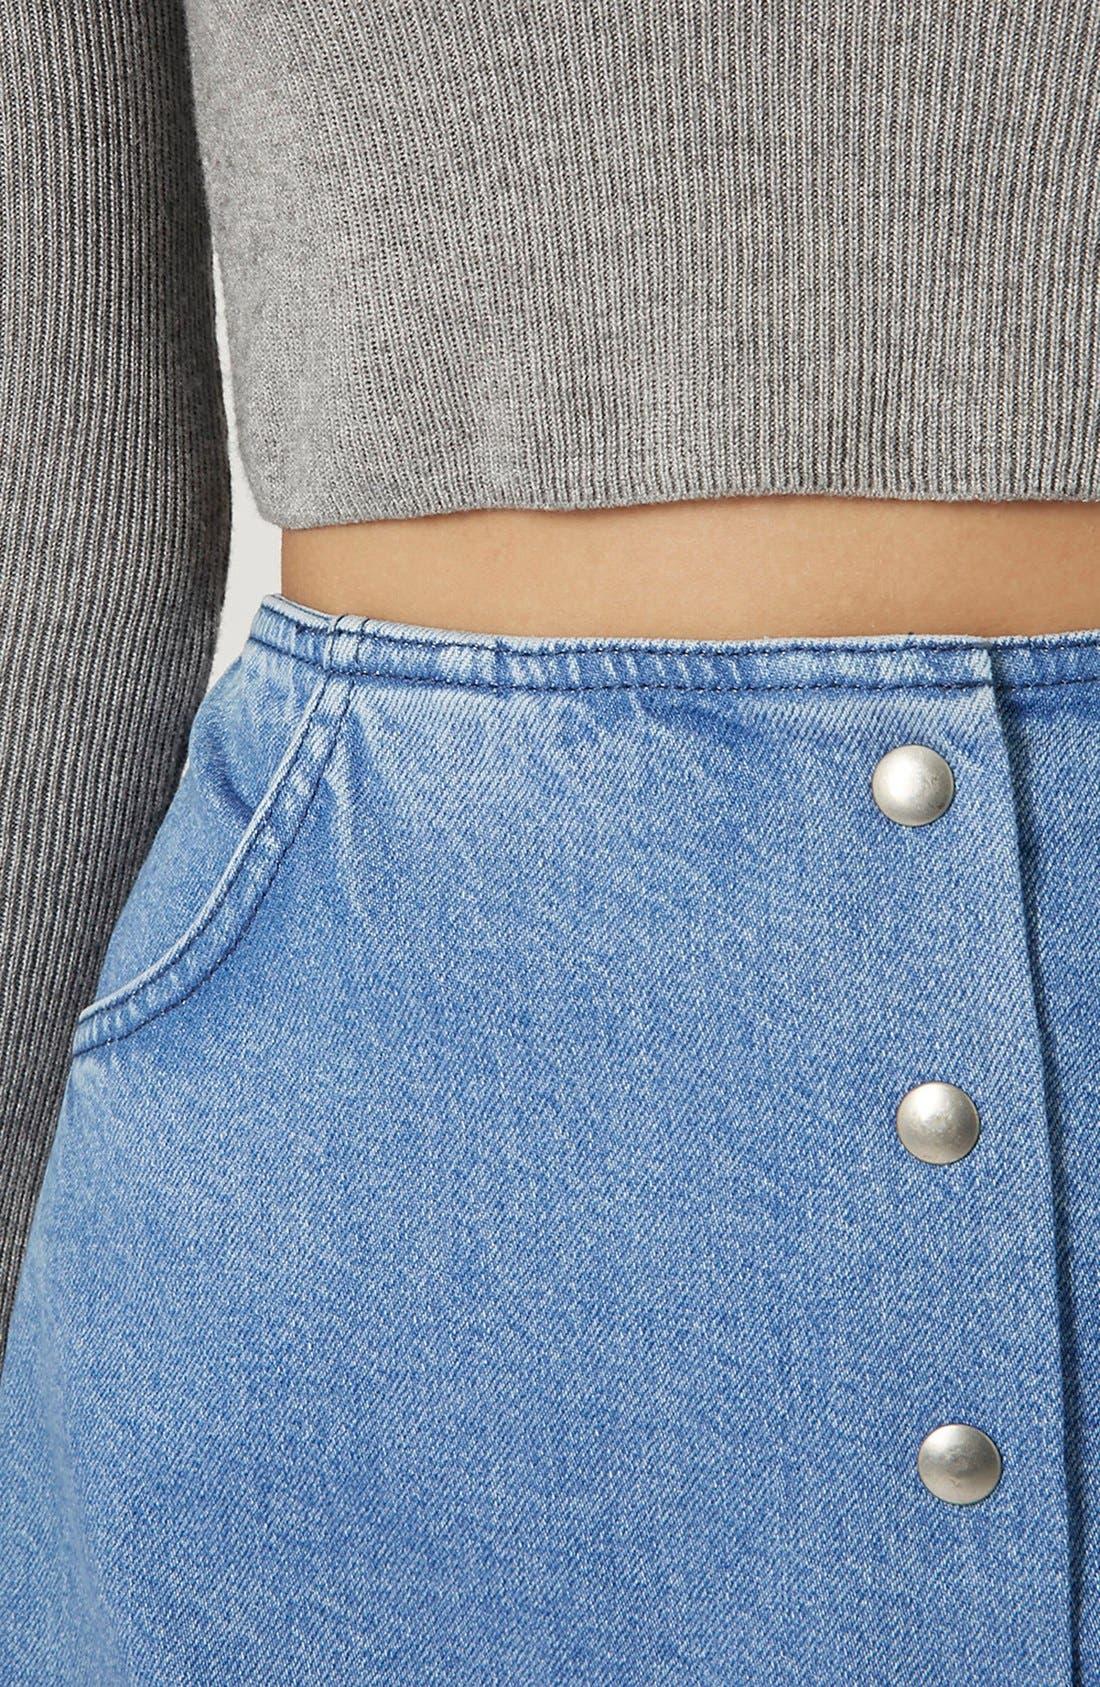 Alternate Image 4  - Topshop Moto Snap Front Denim Skirt (Brit Pop-In)